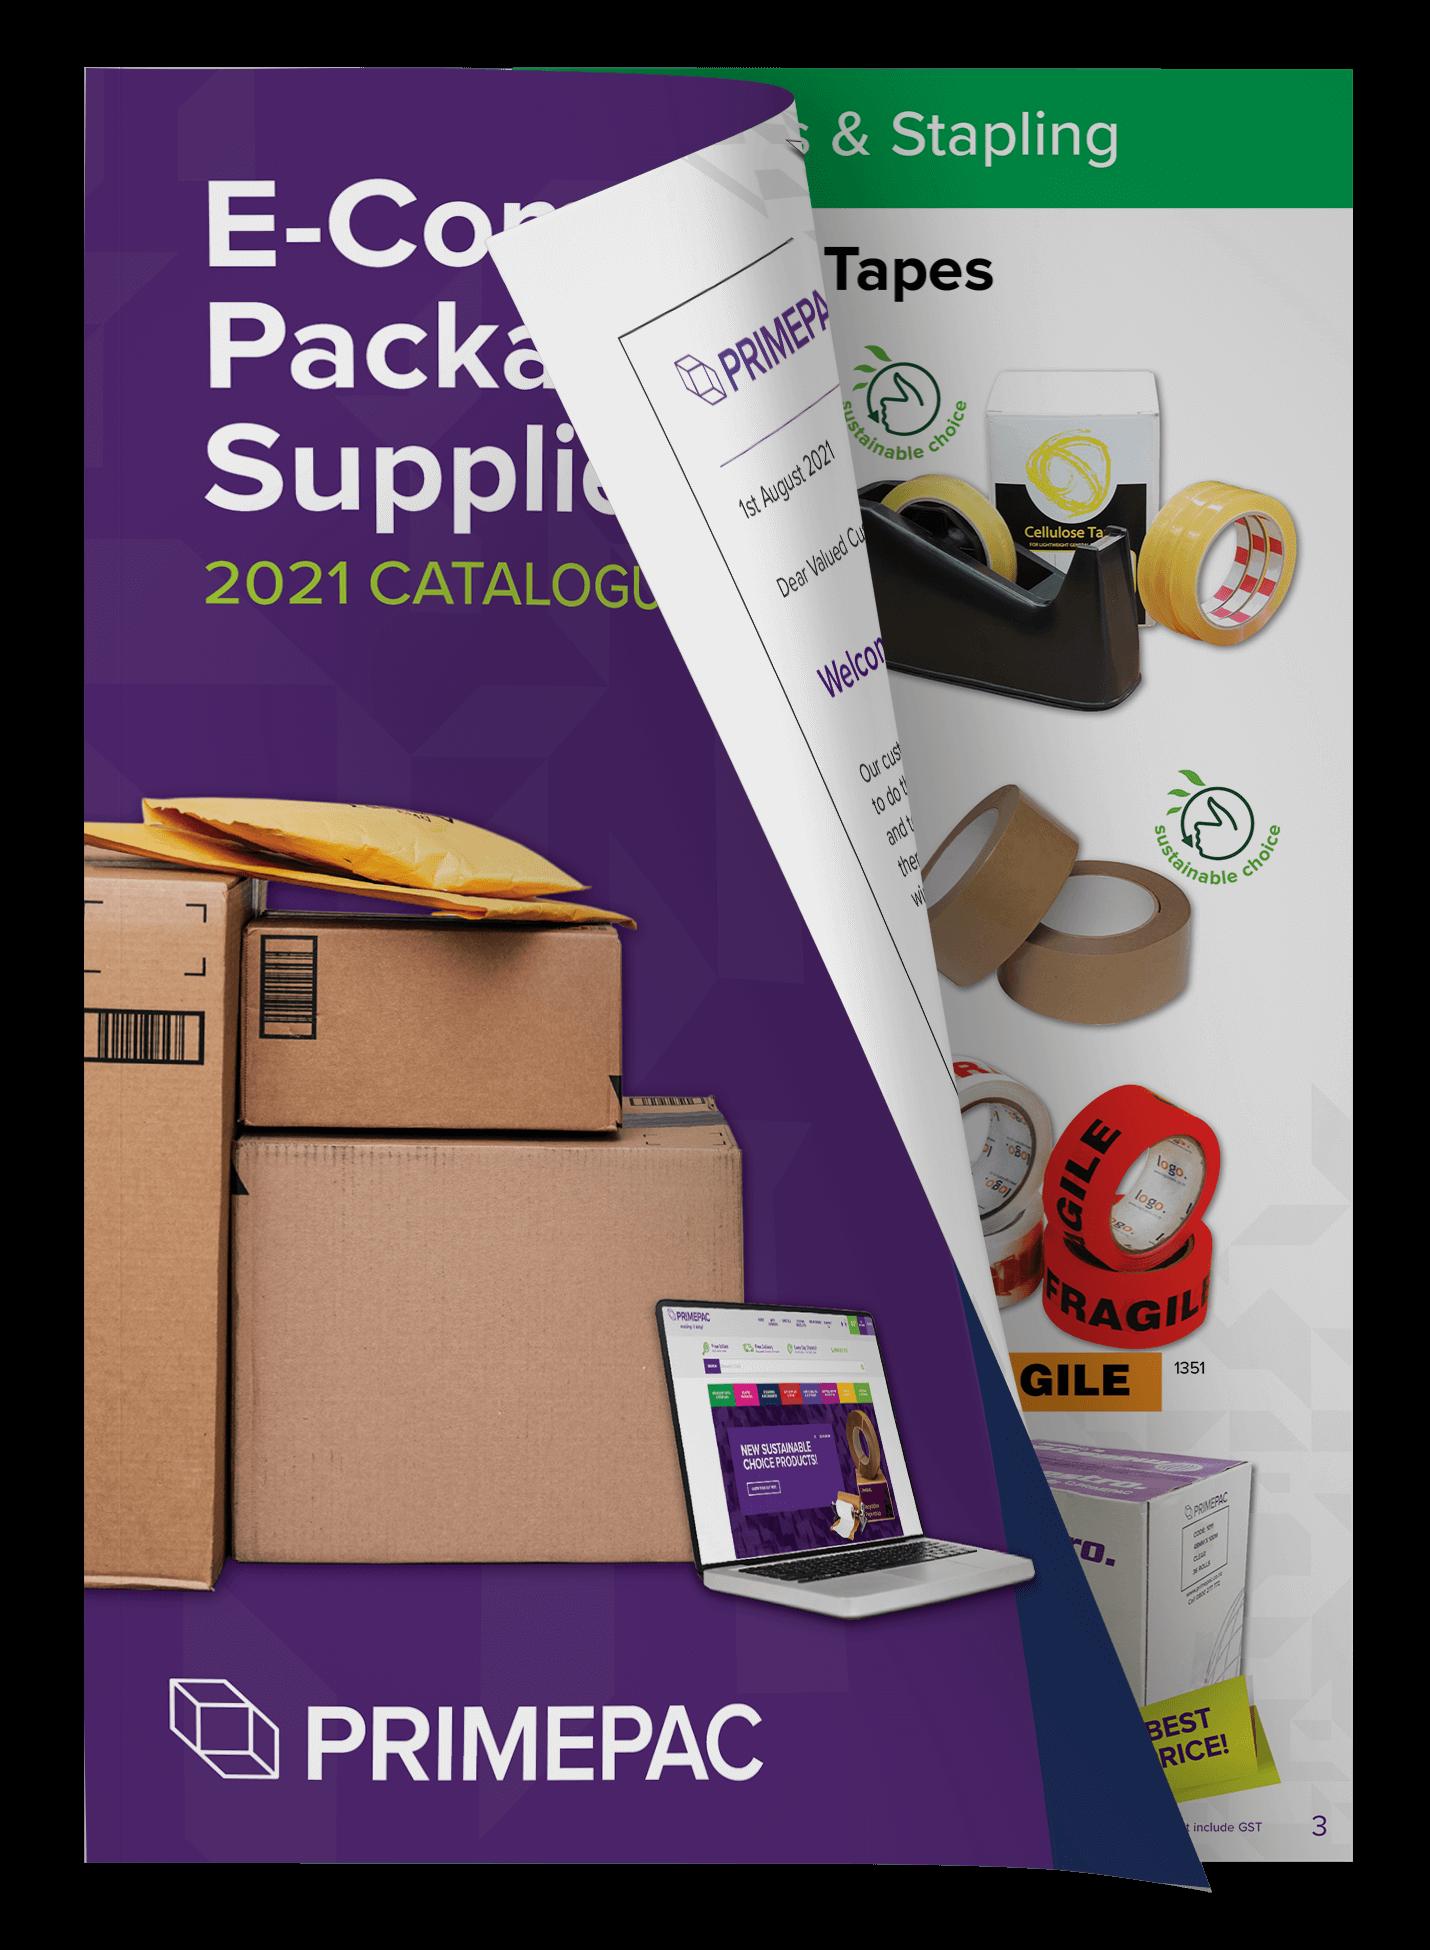 E-Commerce Open Catalogue